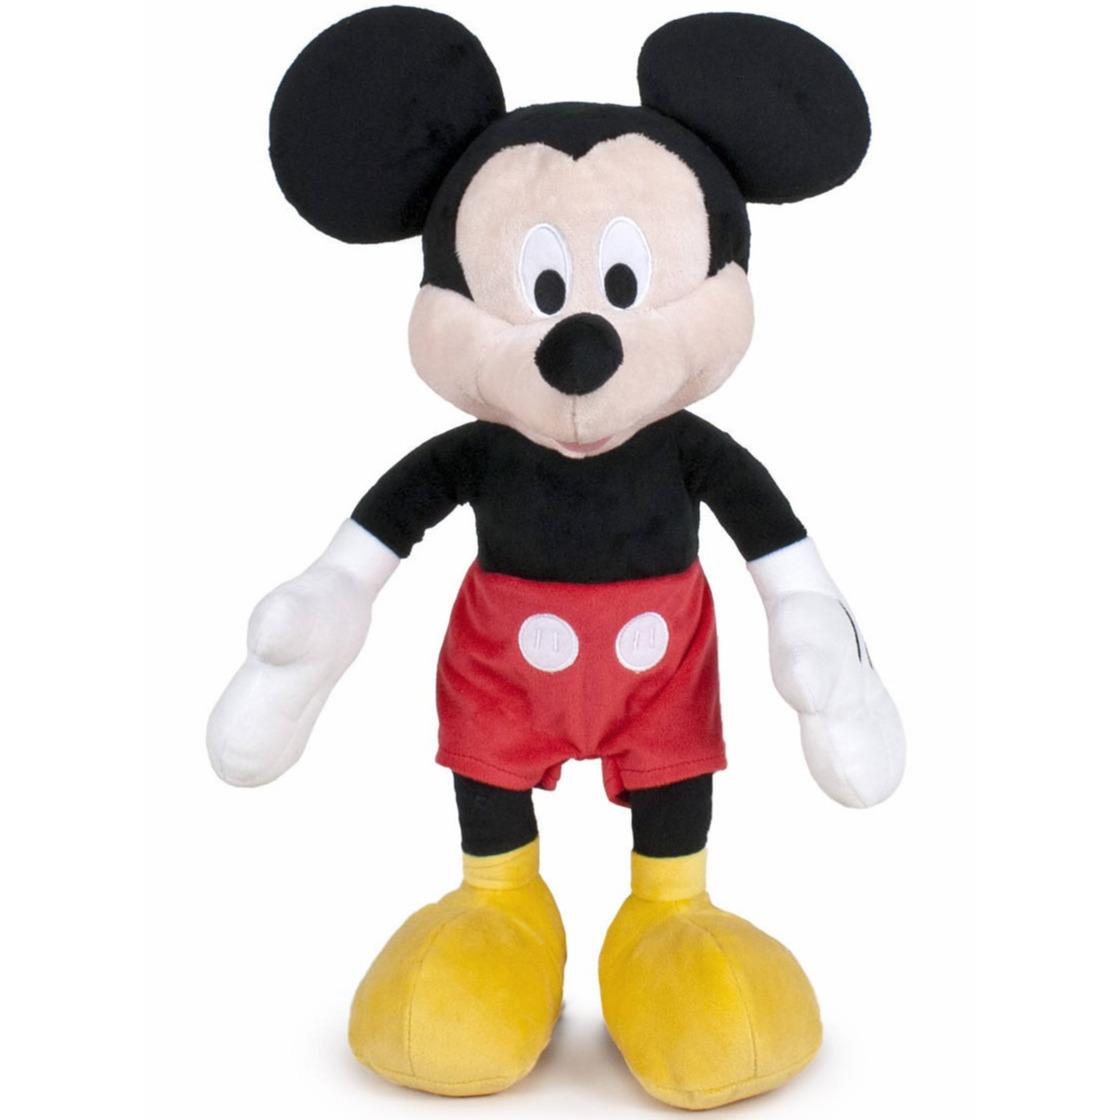 Pluche Disney Mickey Mouse knuffel 30 cm speelgoed